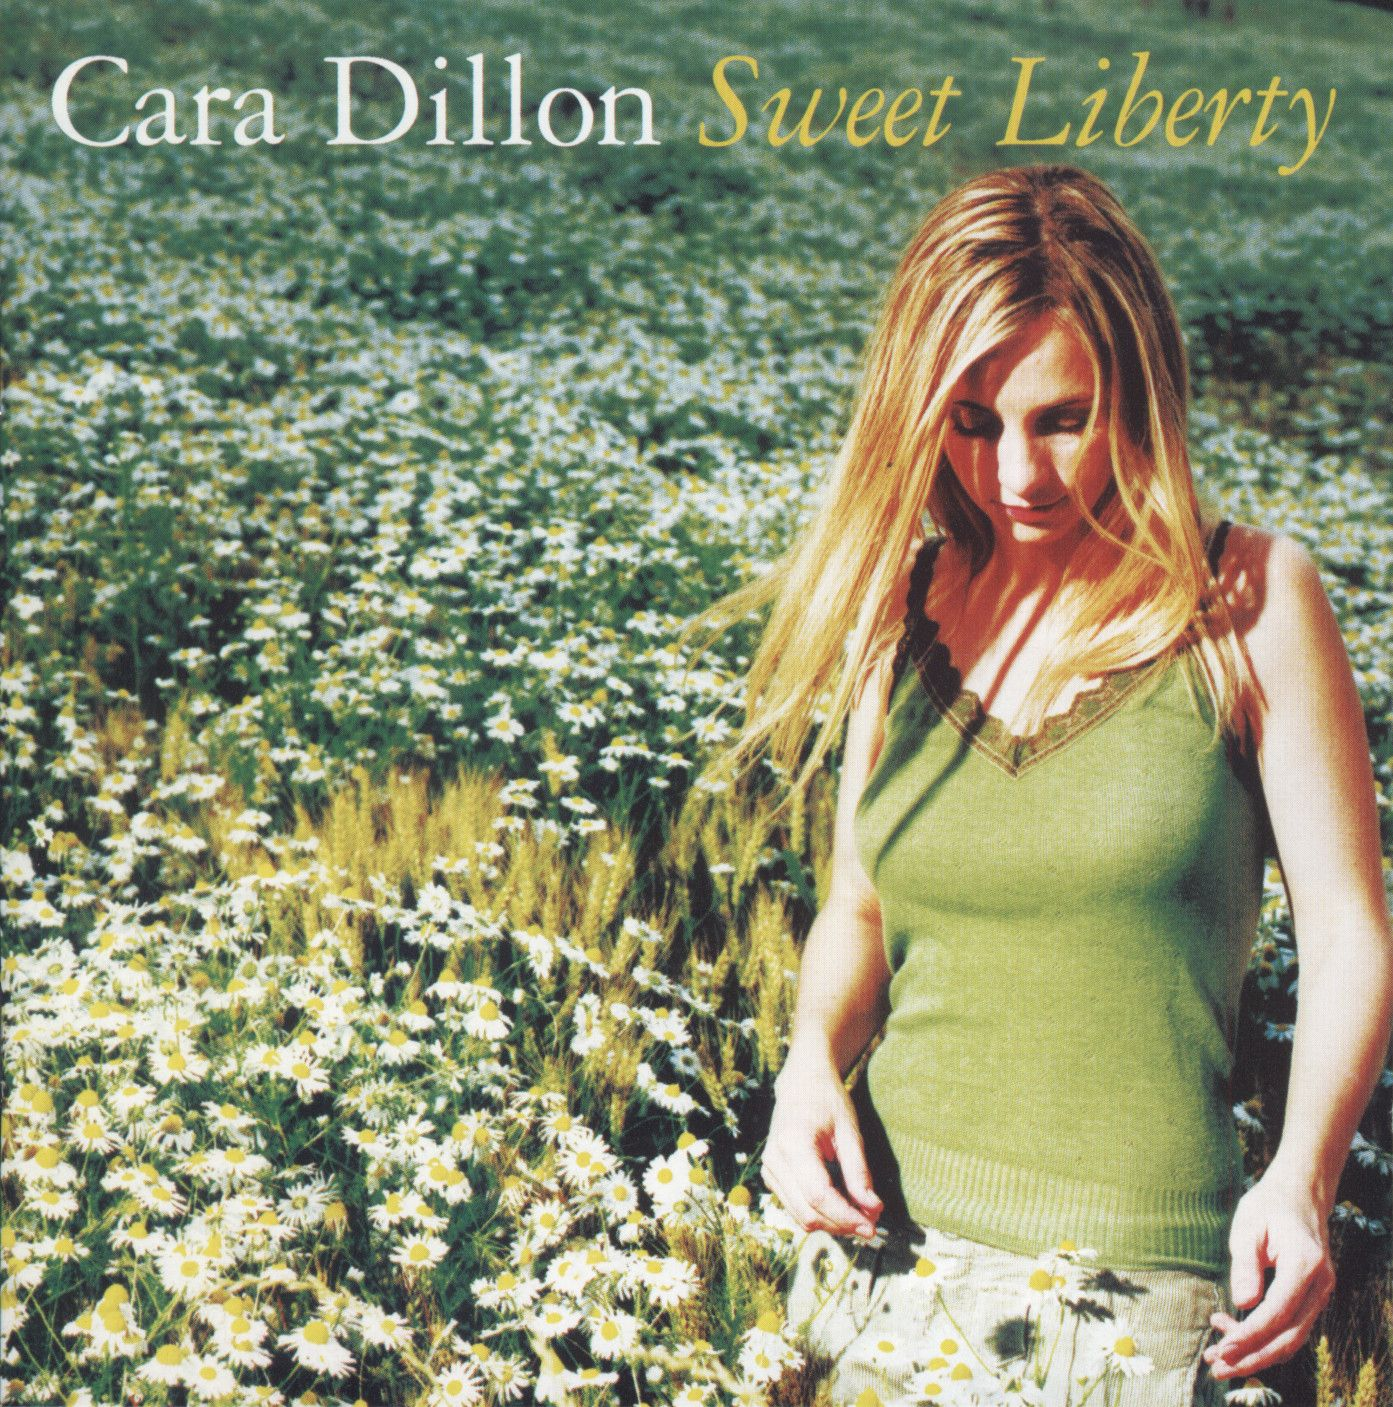 Cara Dillon - Sweet Liberty album cover